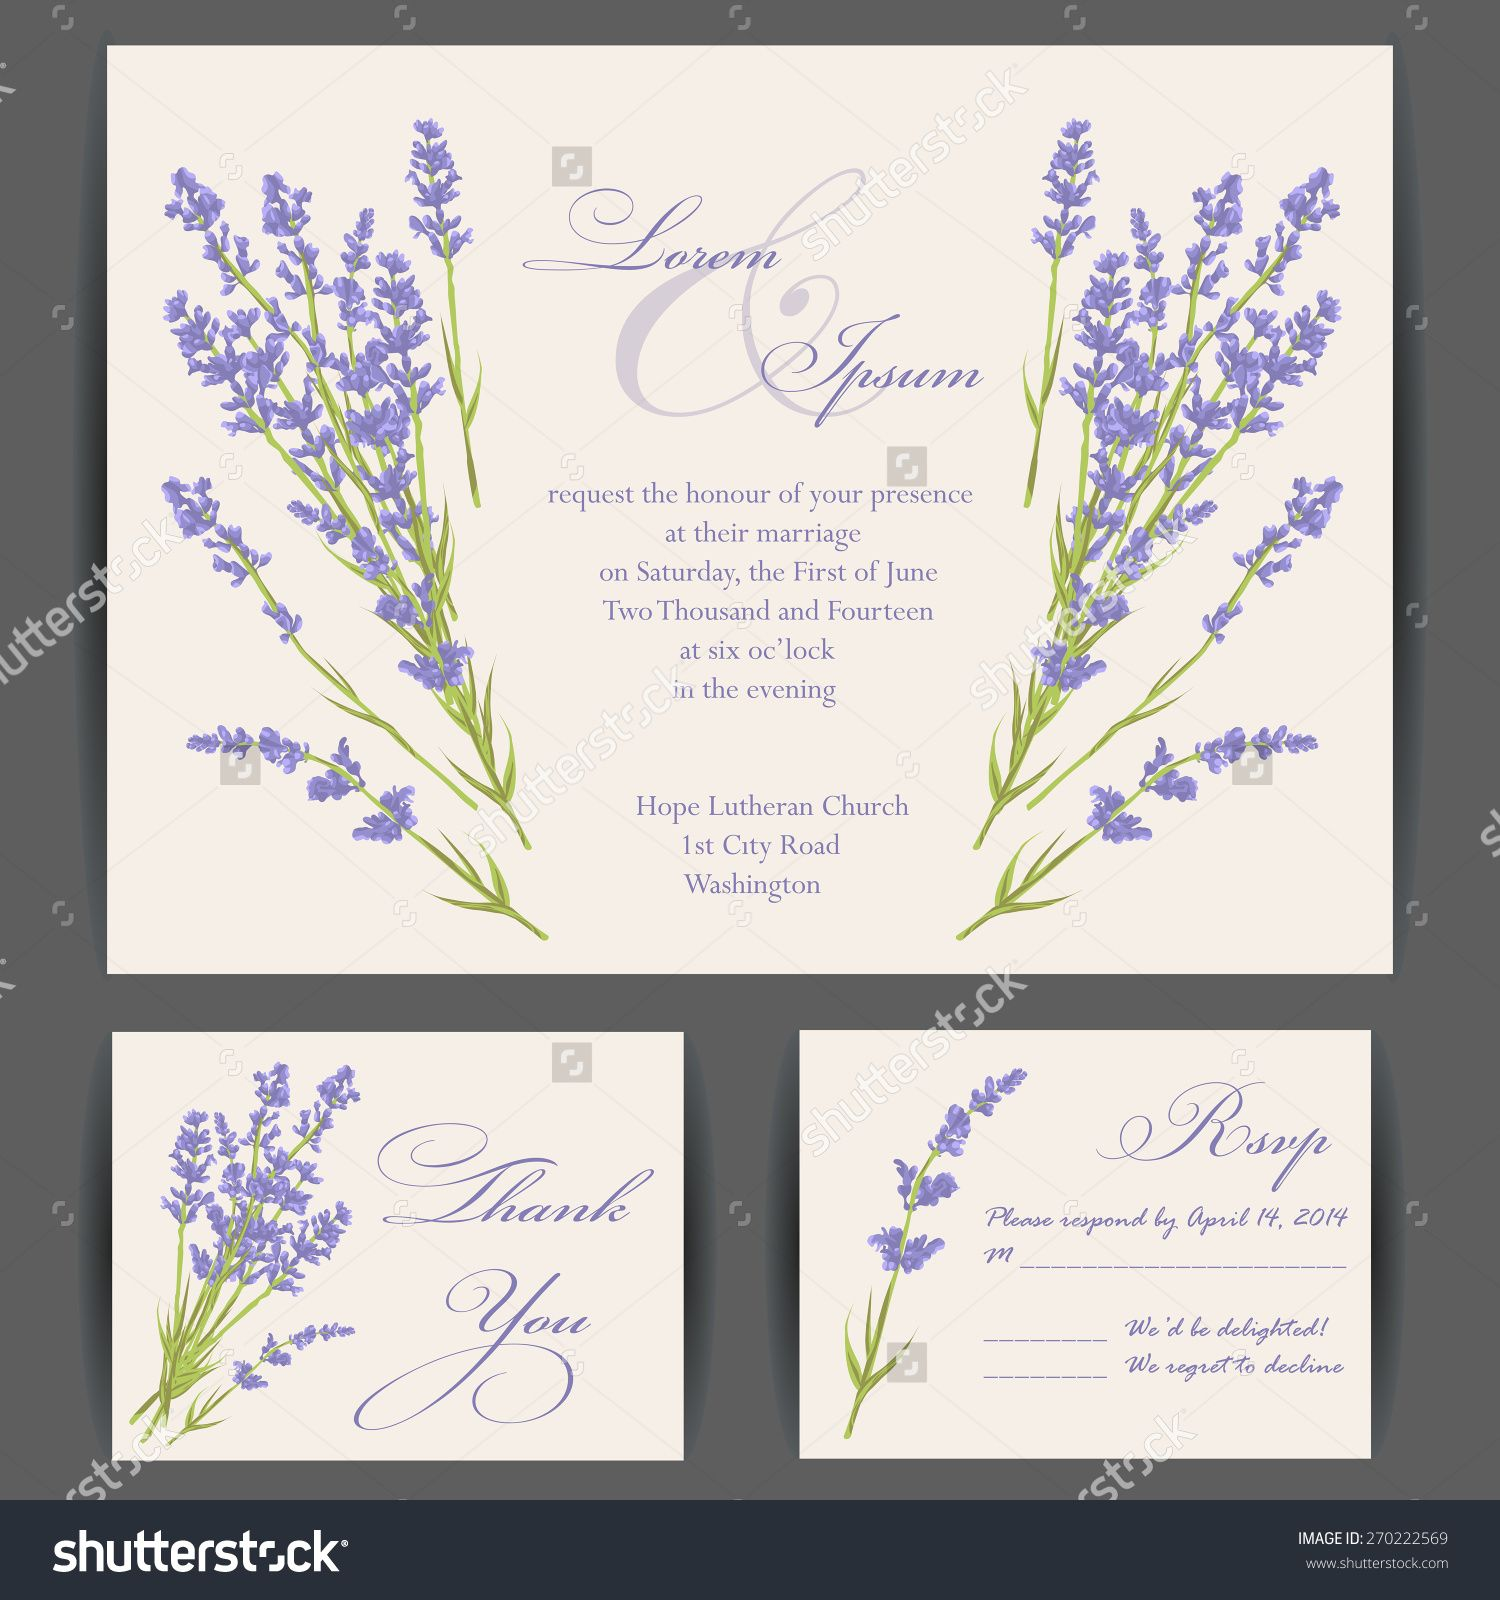 Wedding invitation card with purple lavender flower Vintage